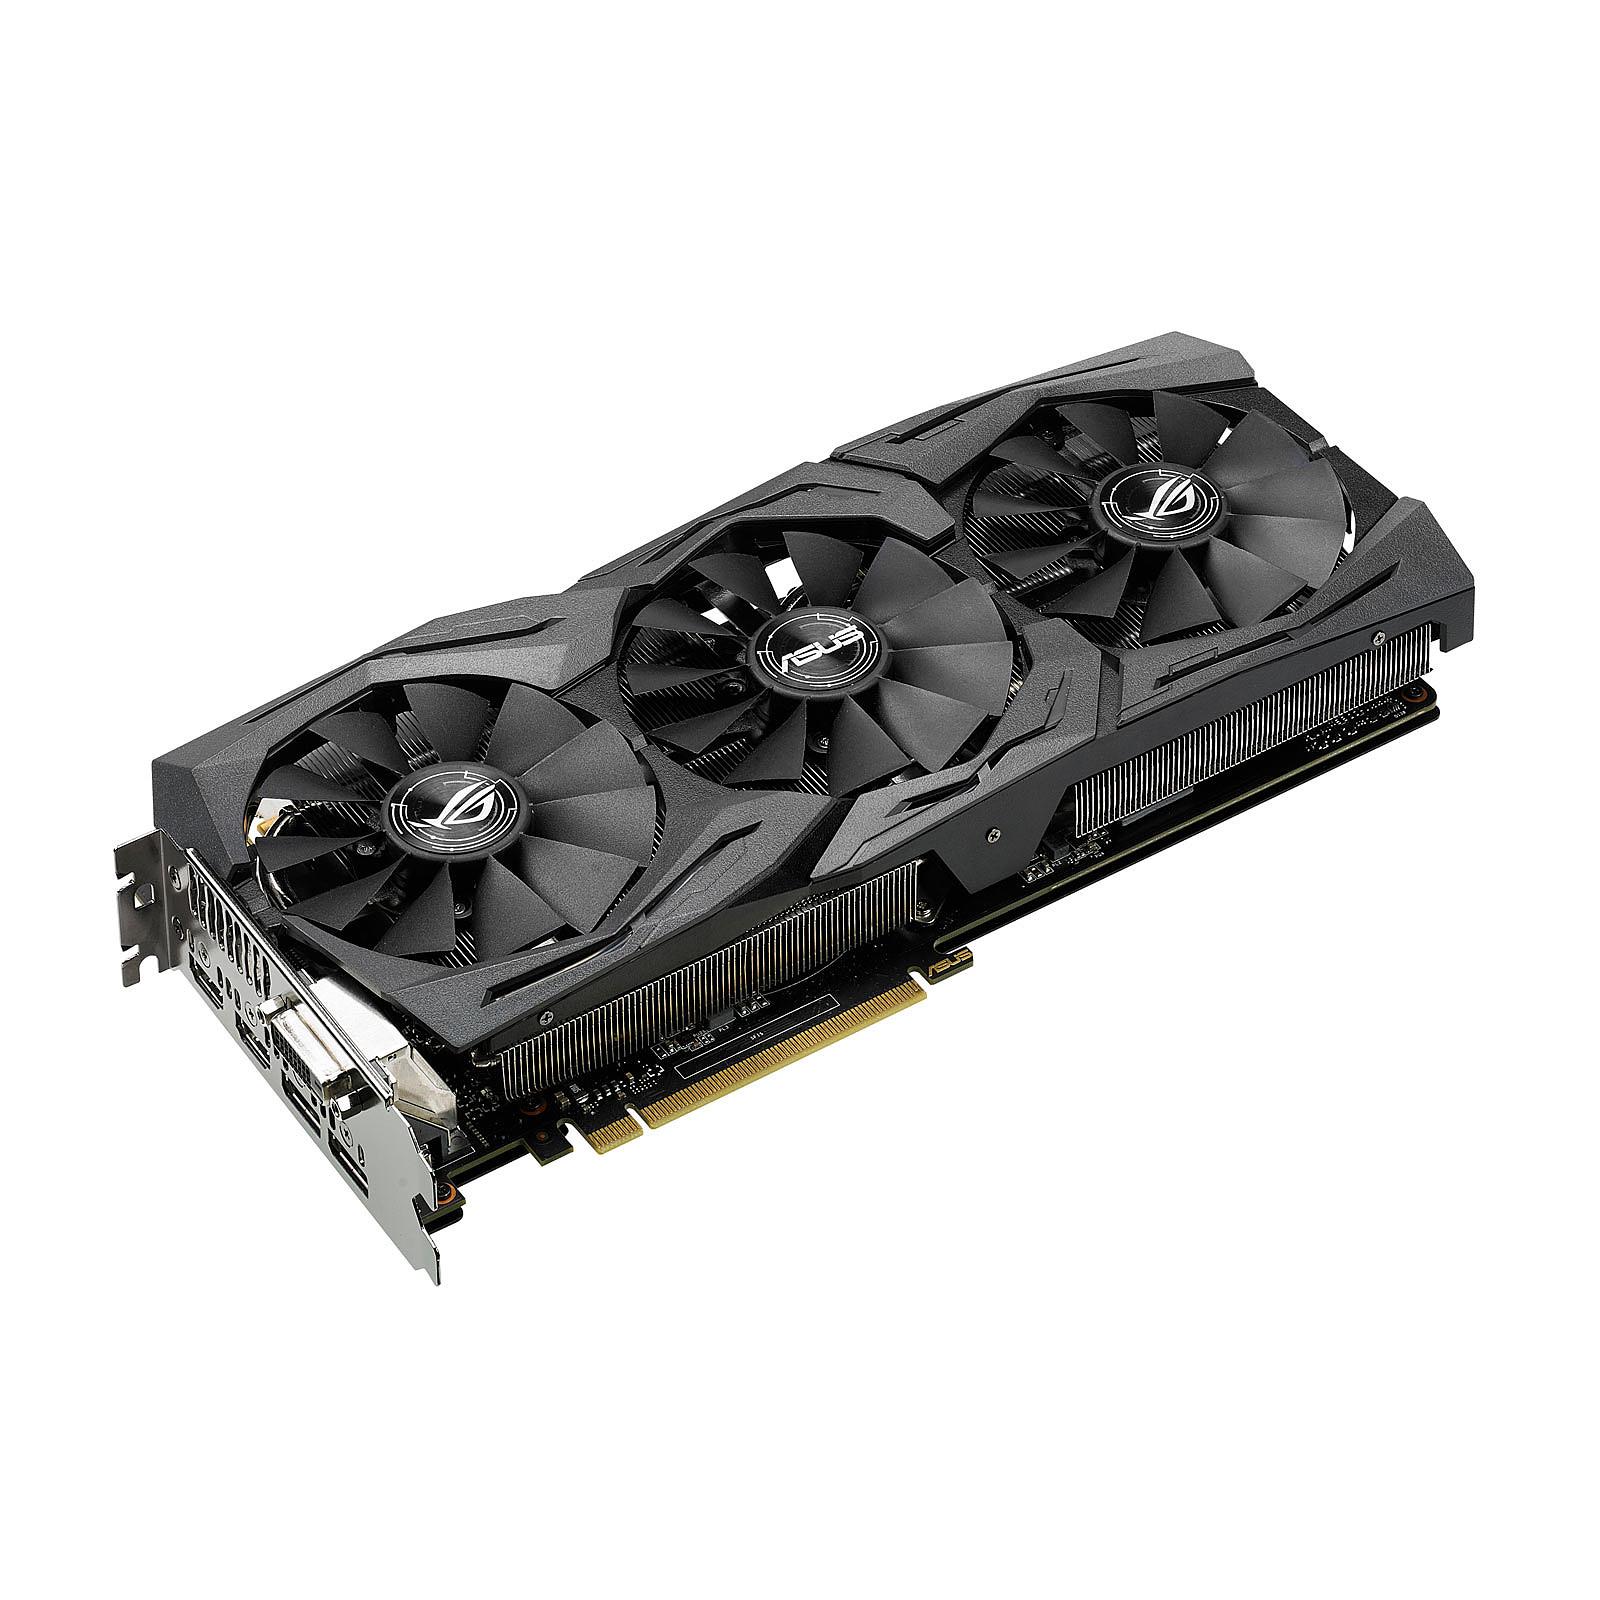 ASUS ROG STRIX-RX480-O8G-GAMING - AMD Radeon RX 480 8 Go